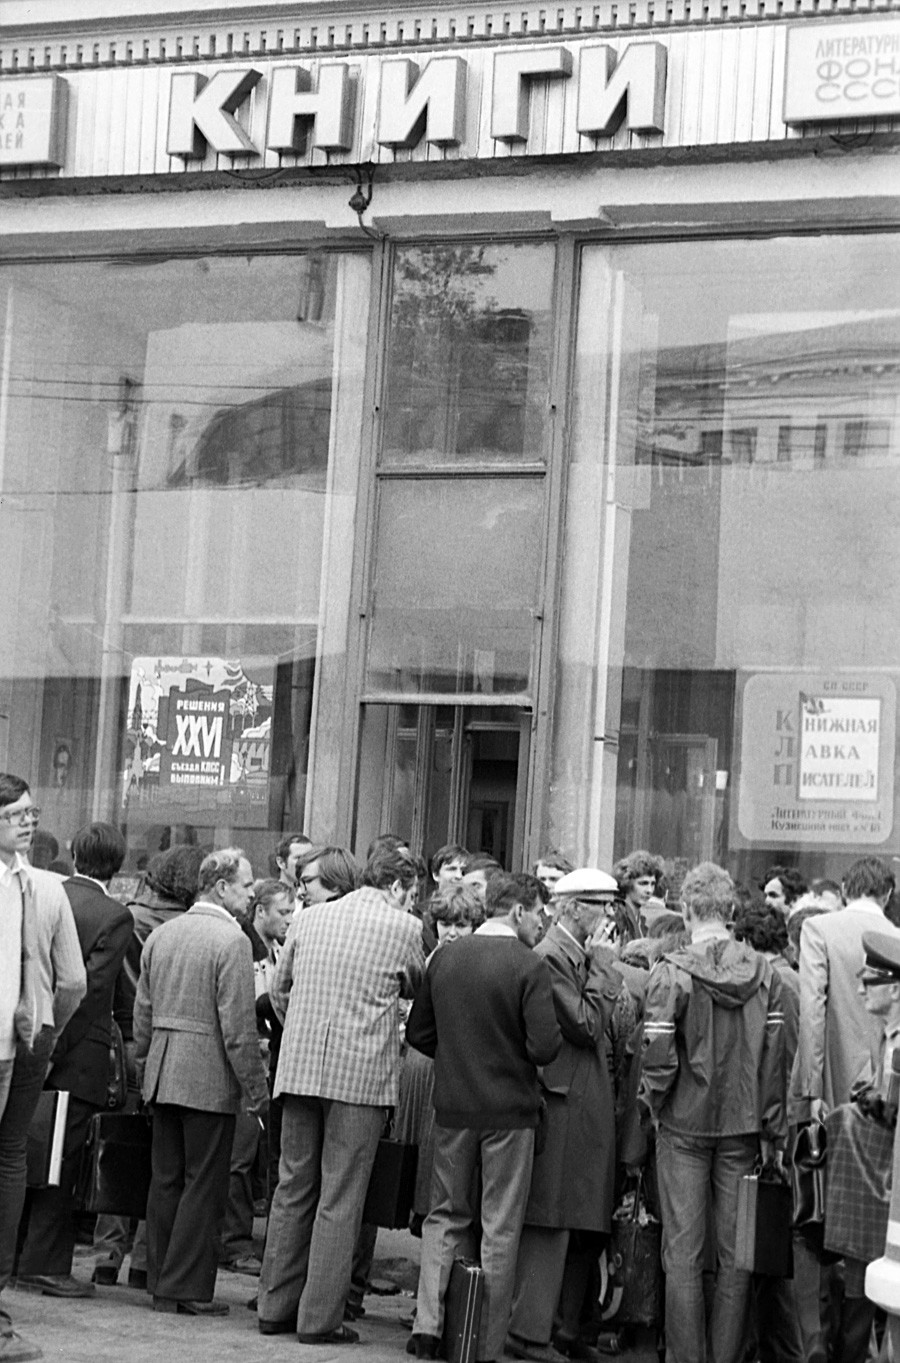 Librairie rue Kouznestki Most, à Moscou, 1981